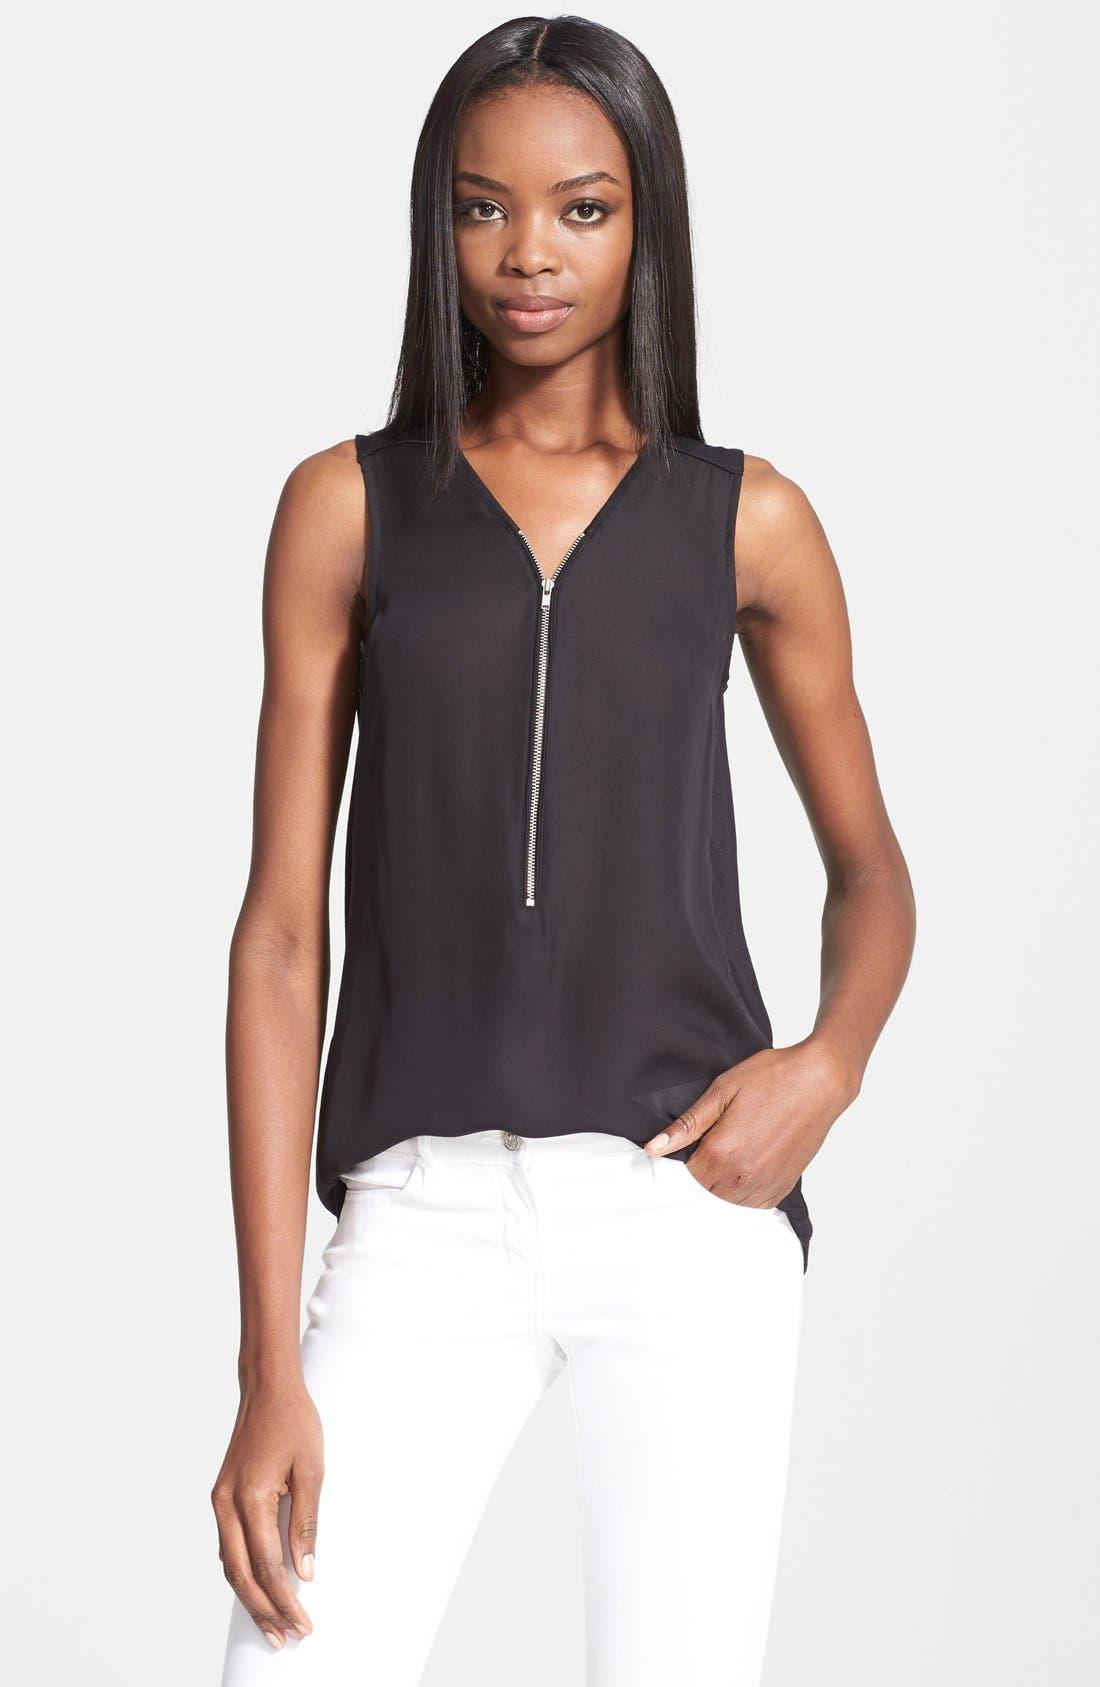 THE KOOPLES SPORT, Asymmetrical Zip Silk Shirt, Main thumbnail 1, color, 001